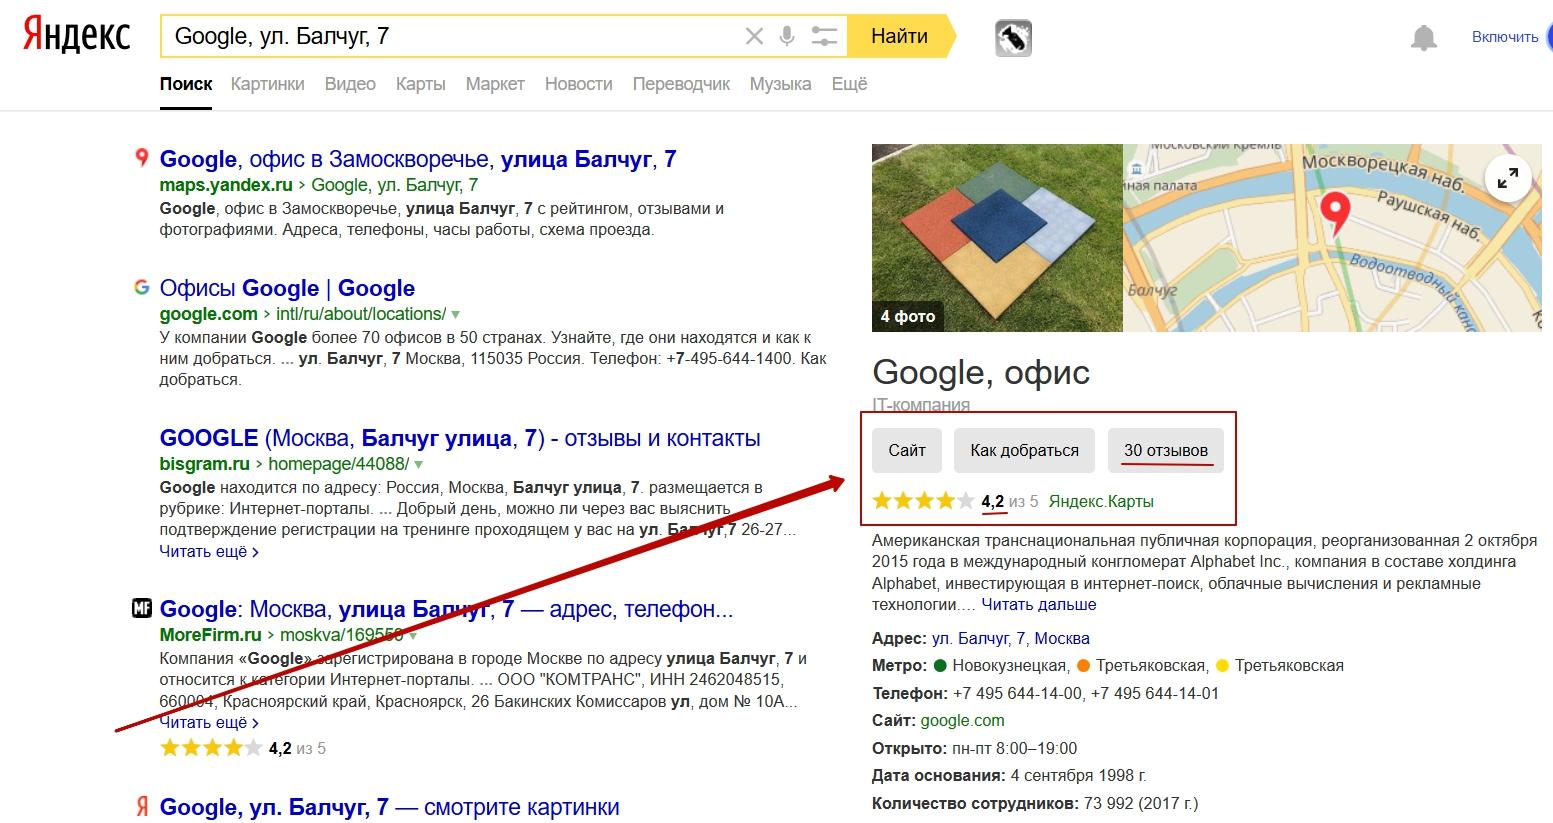 Накрутку отзывов на Яндекс-Картах запустил:)